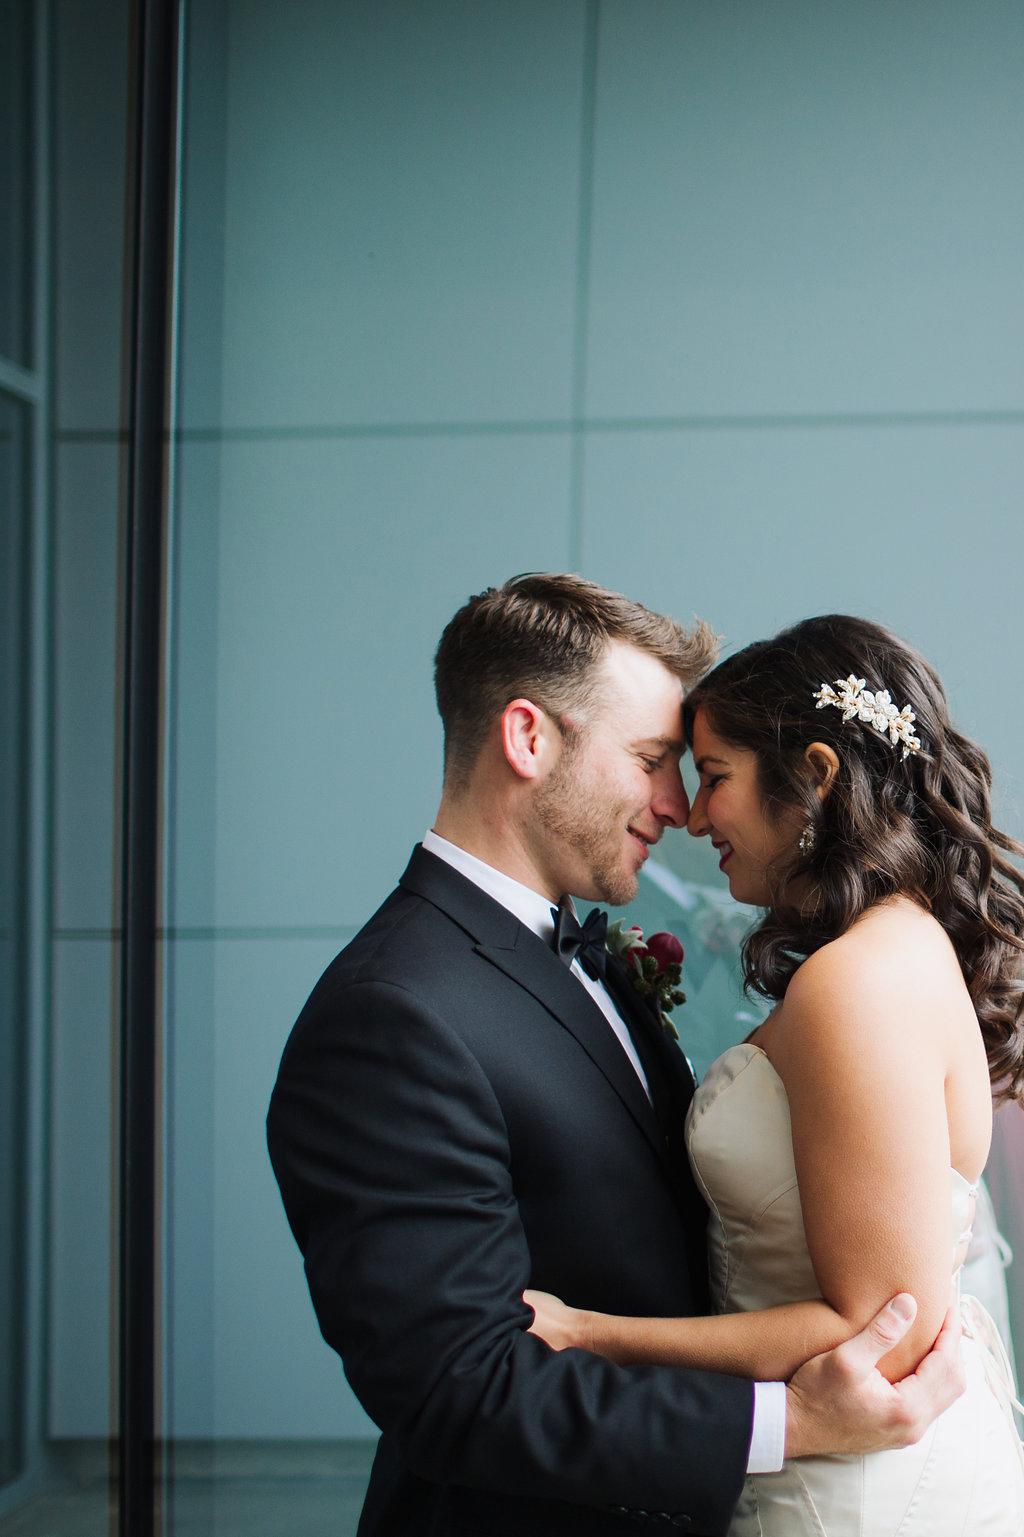 Paige-Newton-Photography-W-Hotel-Wedding-Austin-Photographer0021.jpg